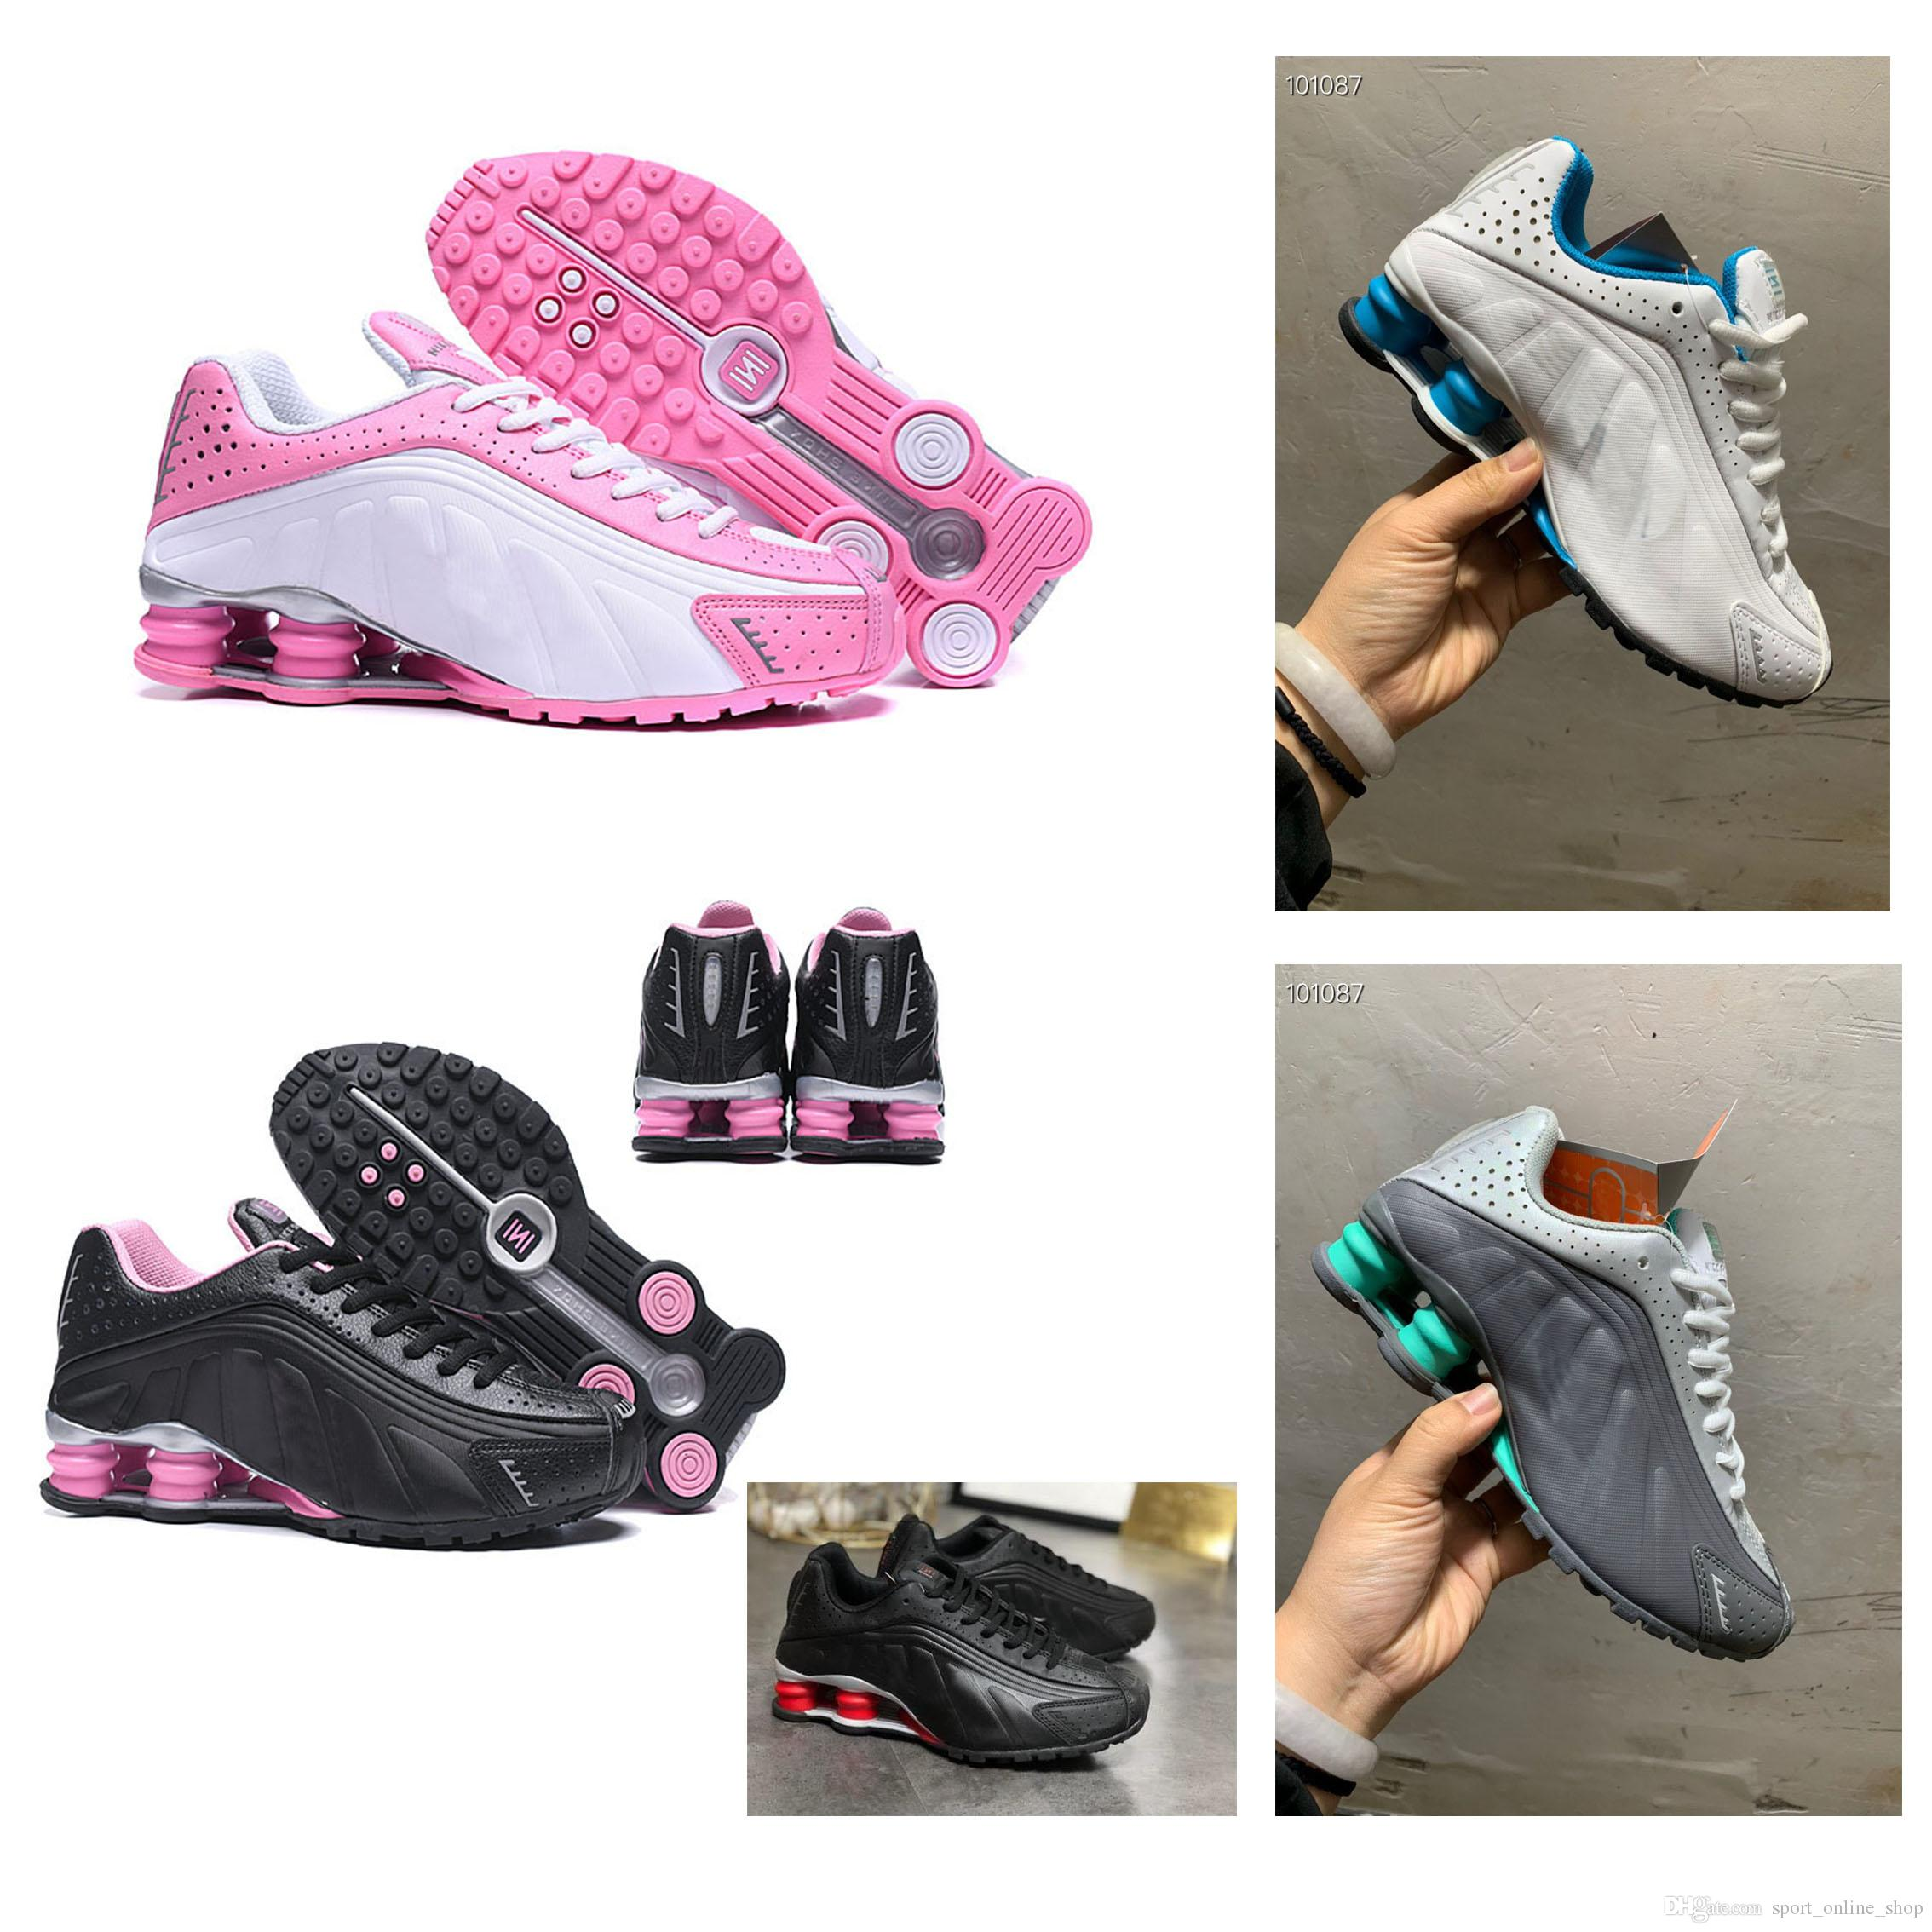 revendeur 43296 c5977 Women sports shoes Zapatos Hombre Shox Chaussures R4 Nz Designer Sneakers  women Sport Trianers Tn Athletic Shoes Sizes Eur36~40